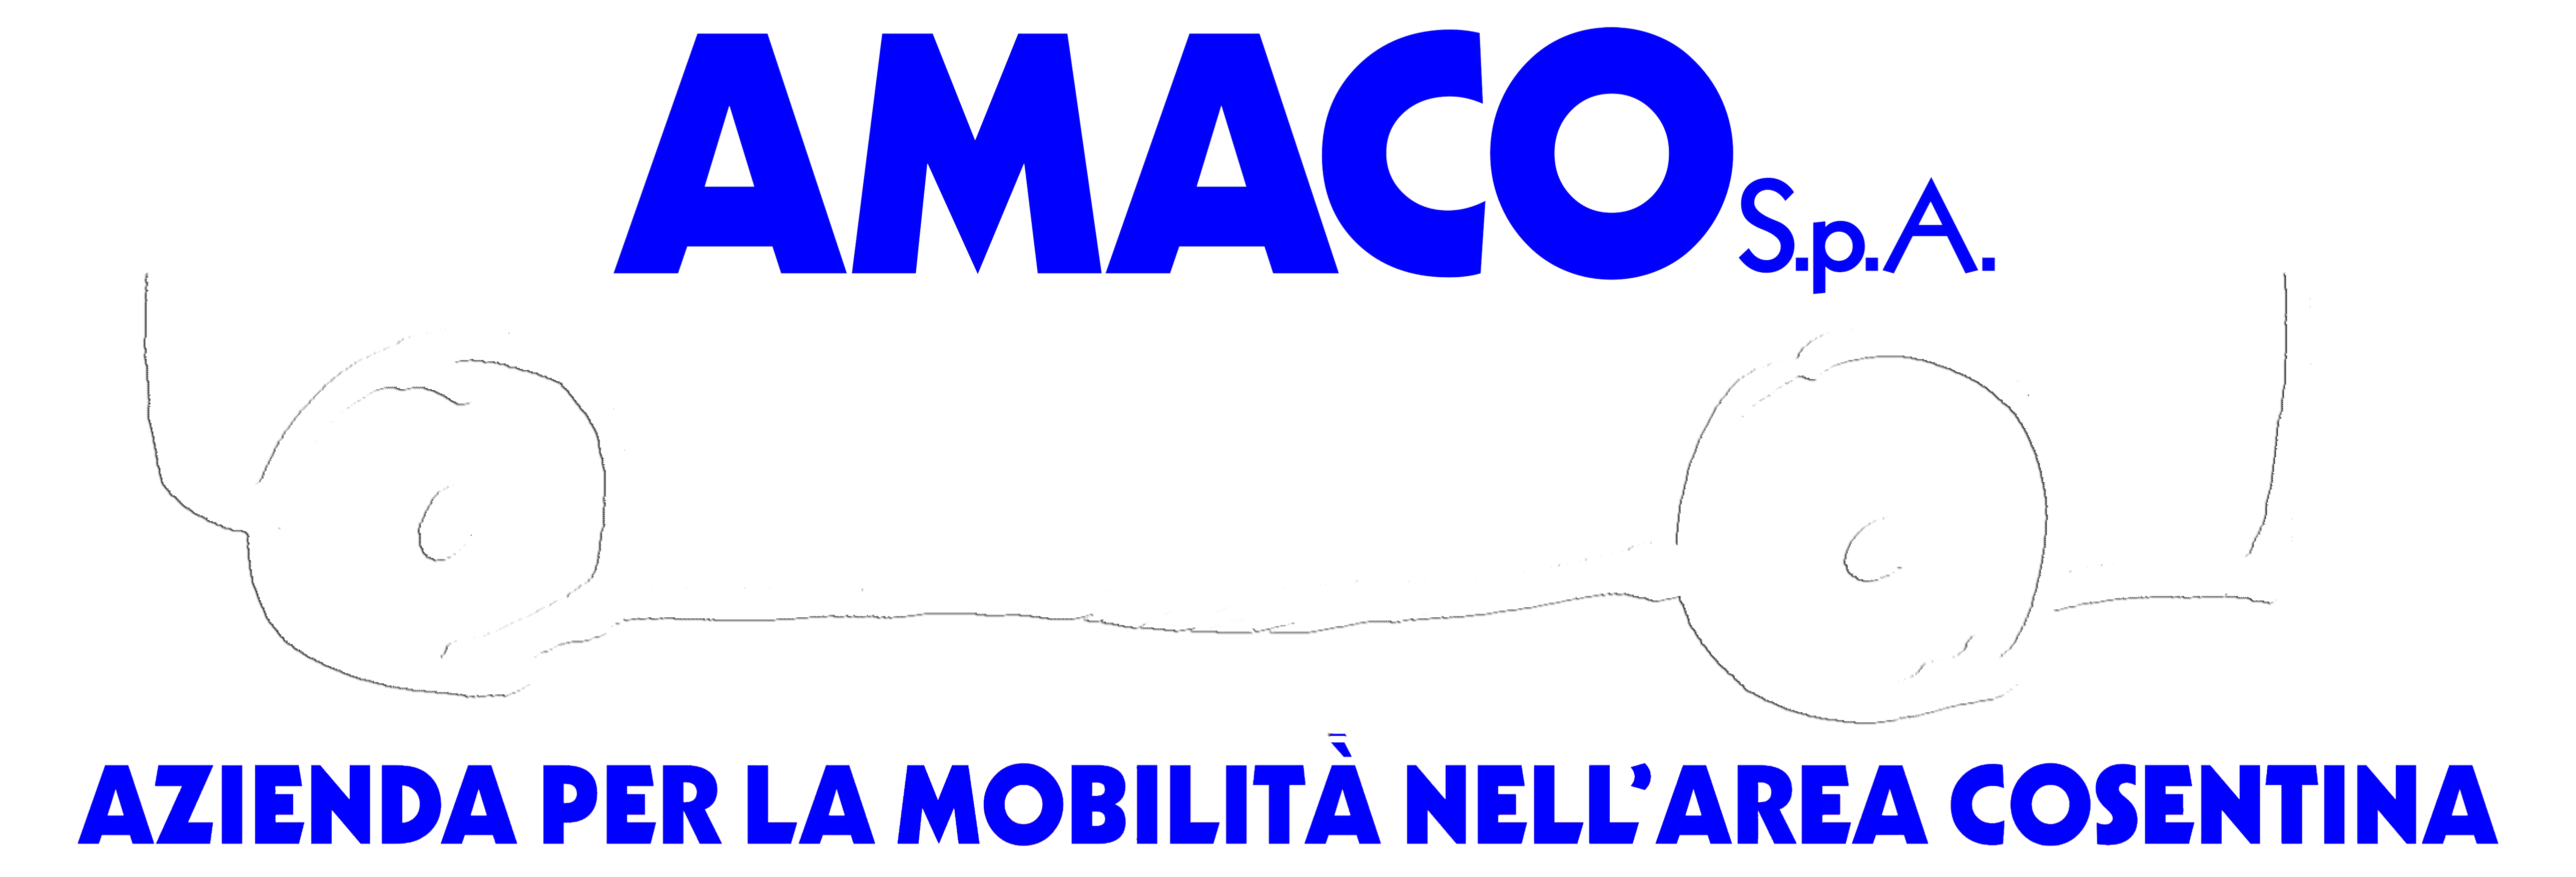 AMACO s.p.a